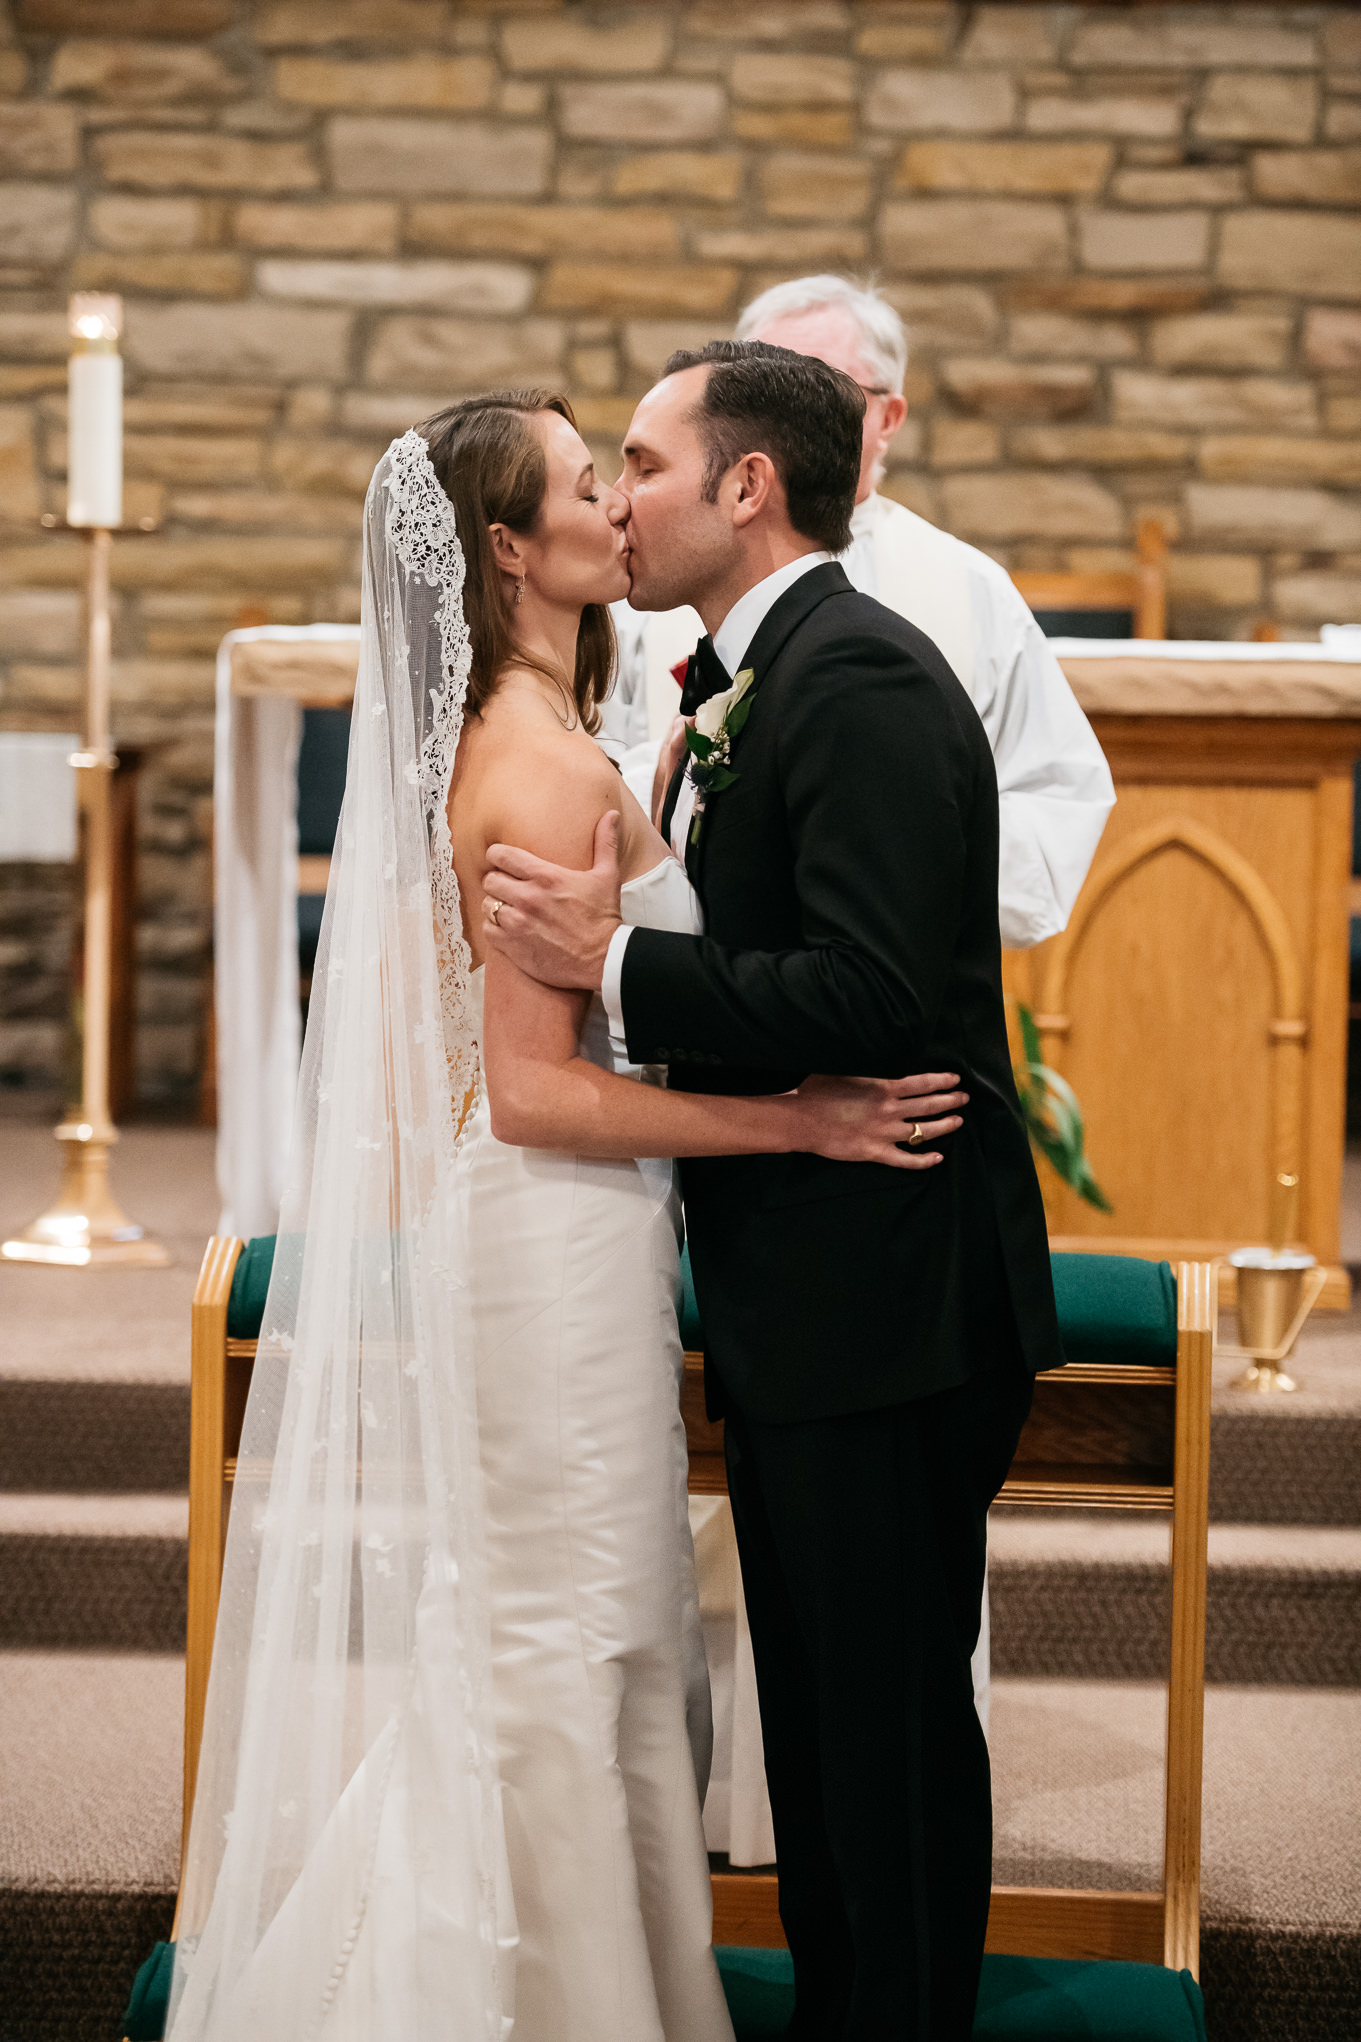 442_ONL_Mairin_Brian_Wedding_Trevor_Hooper_Photo.jpg